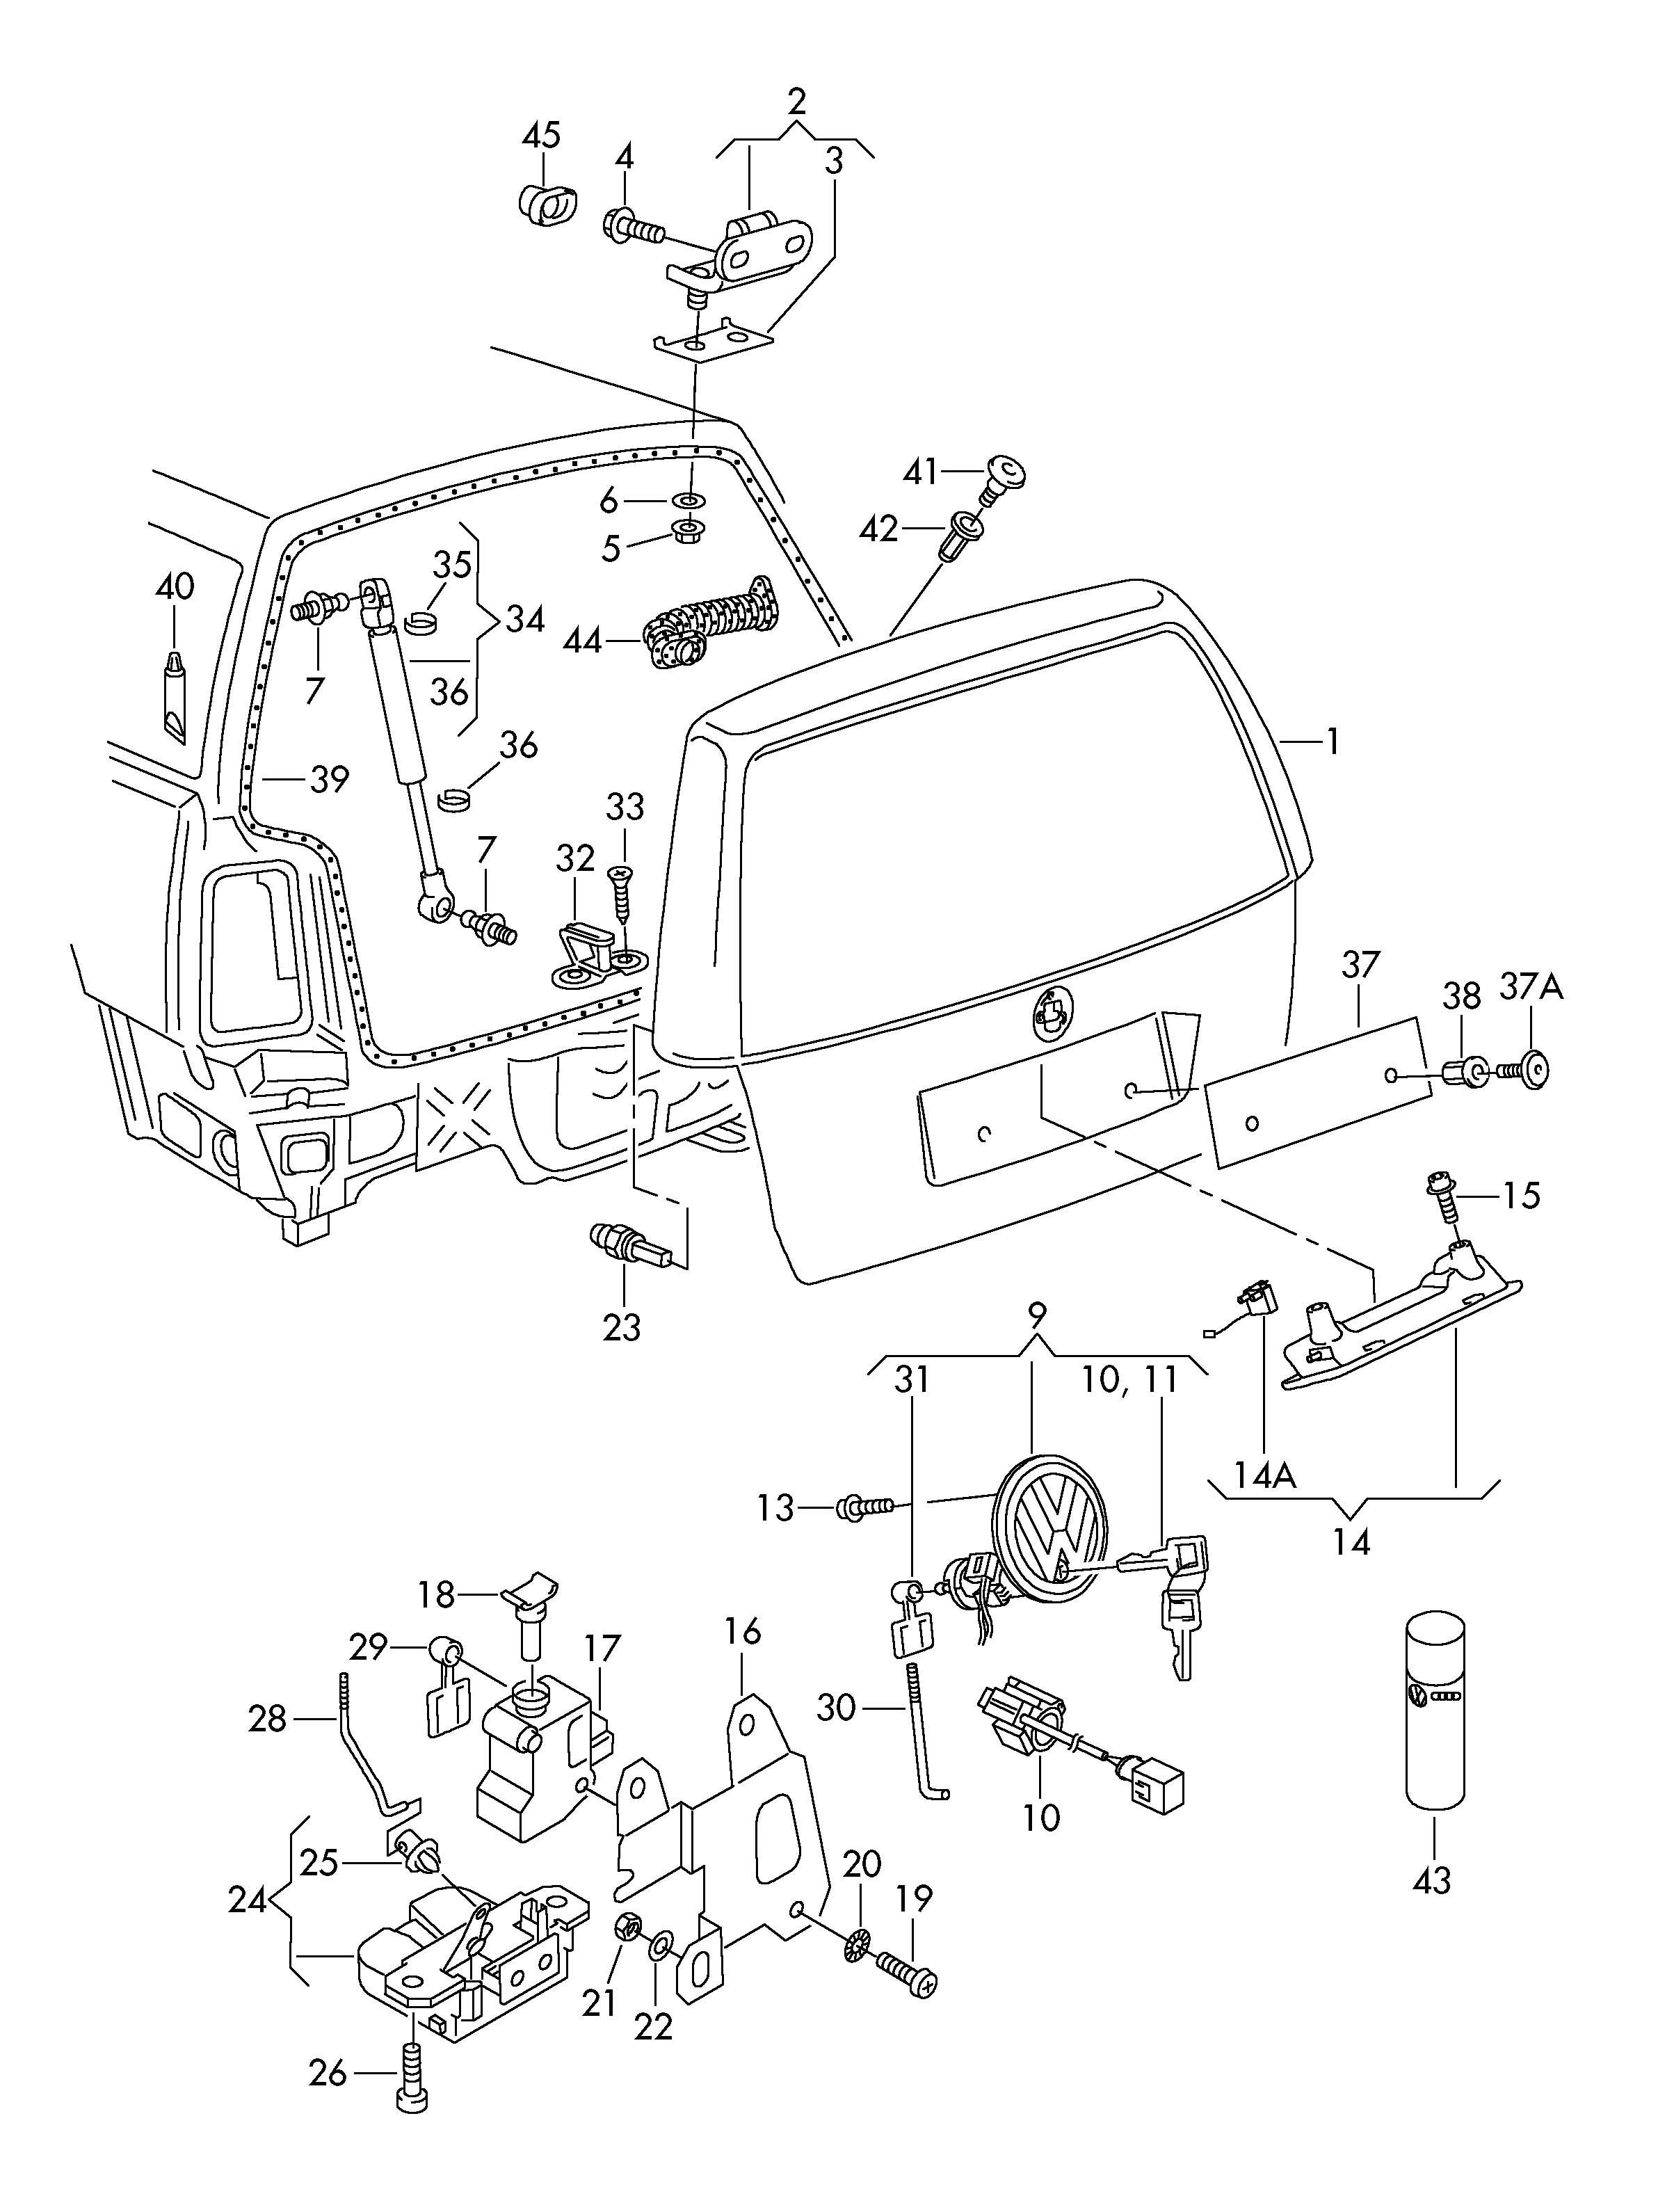 Vw Jetta Body Parts Diagram